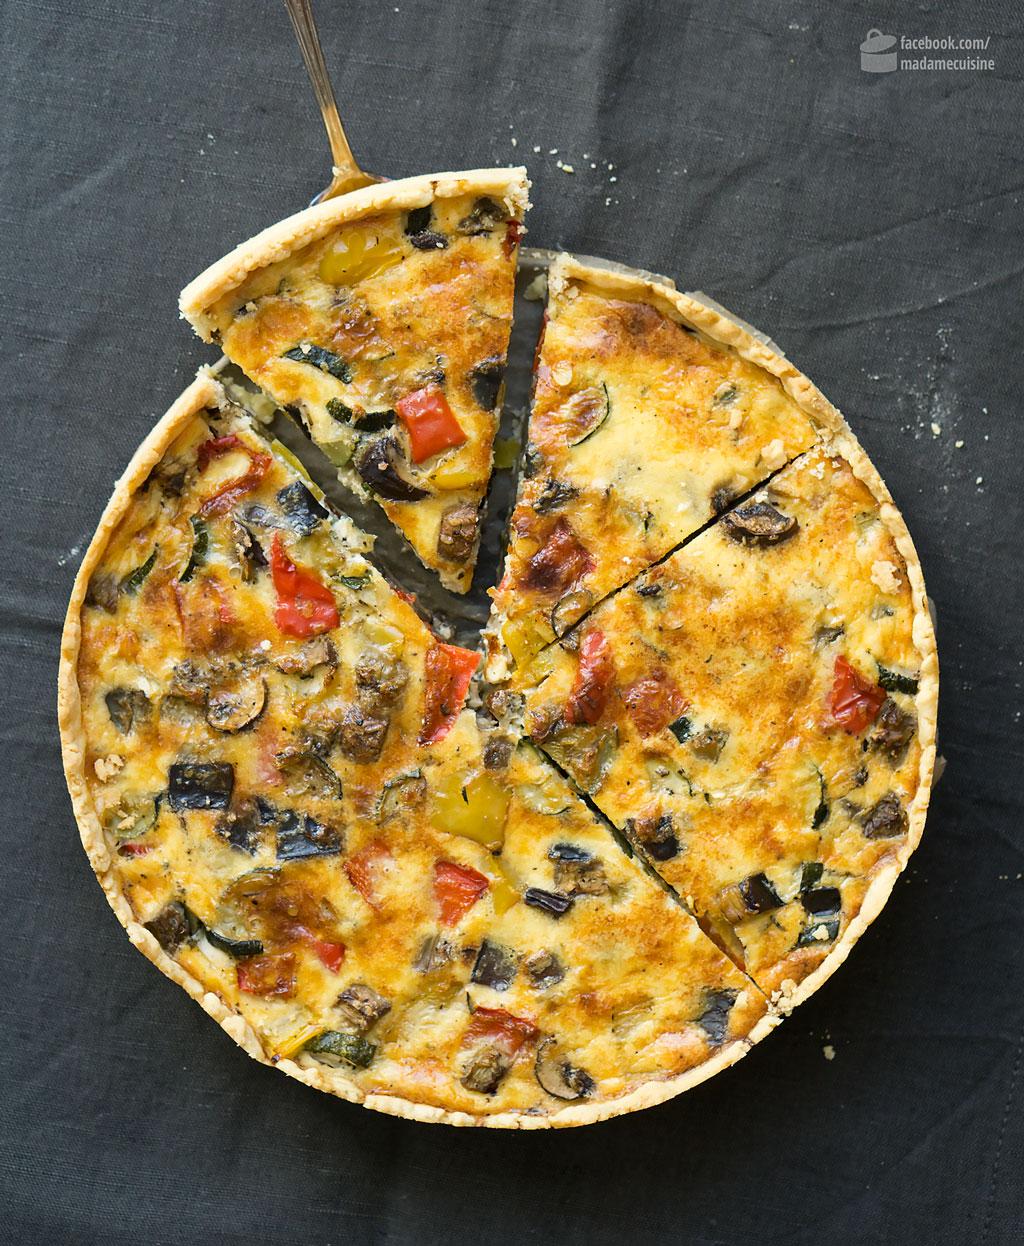 Ratatouille-Quiche (Gemüsekuchen) | Madame Cuisine Rezept